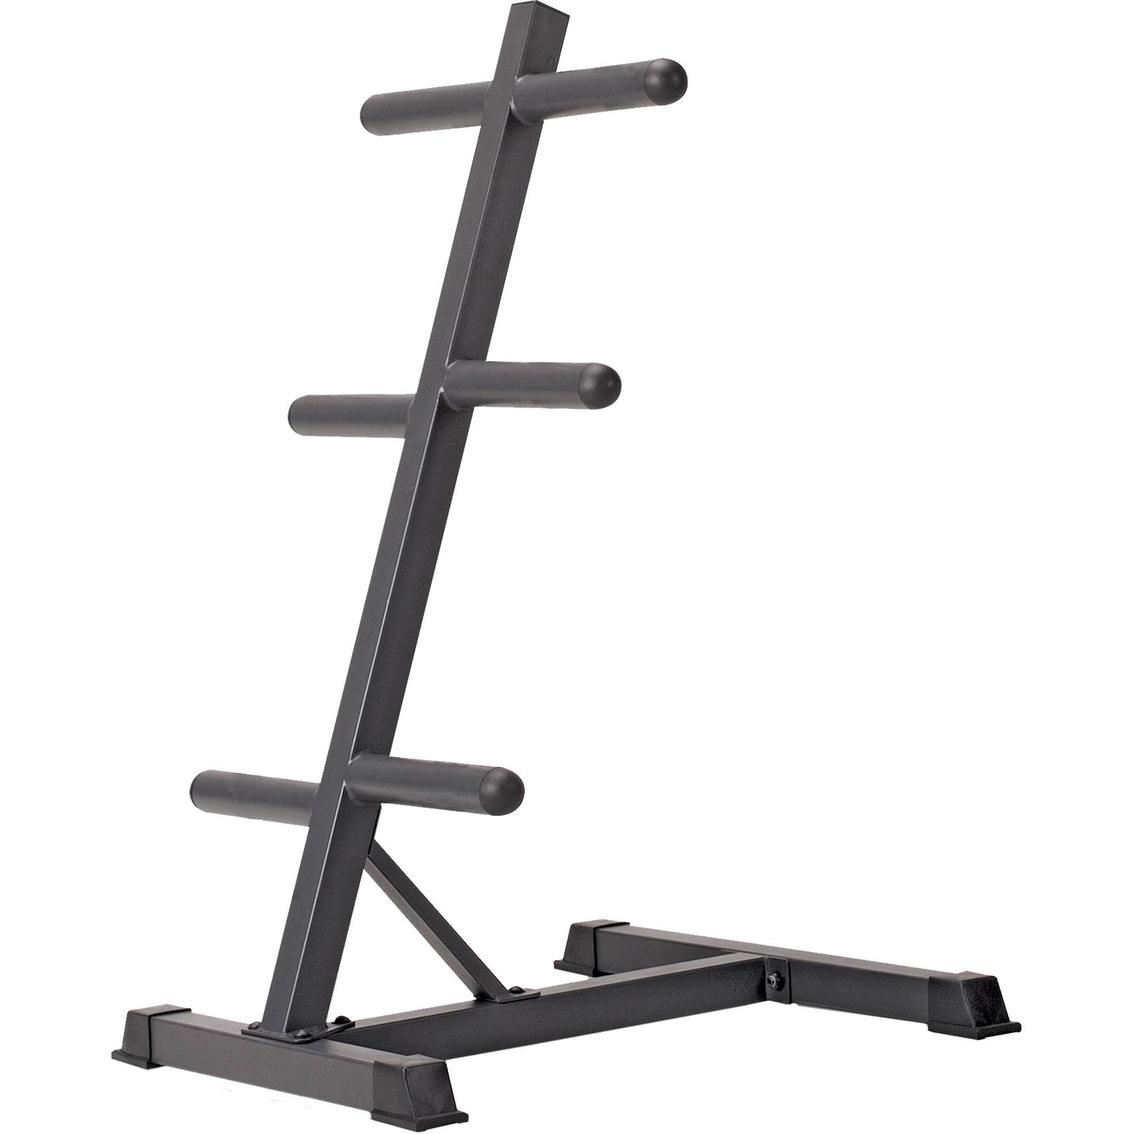 1007  sc 1 st  ShopMyExchange.com & Marcy Weight Plate Racks/olympic Weight Plate Tree | Strength ...